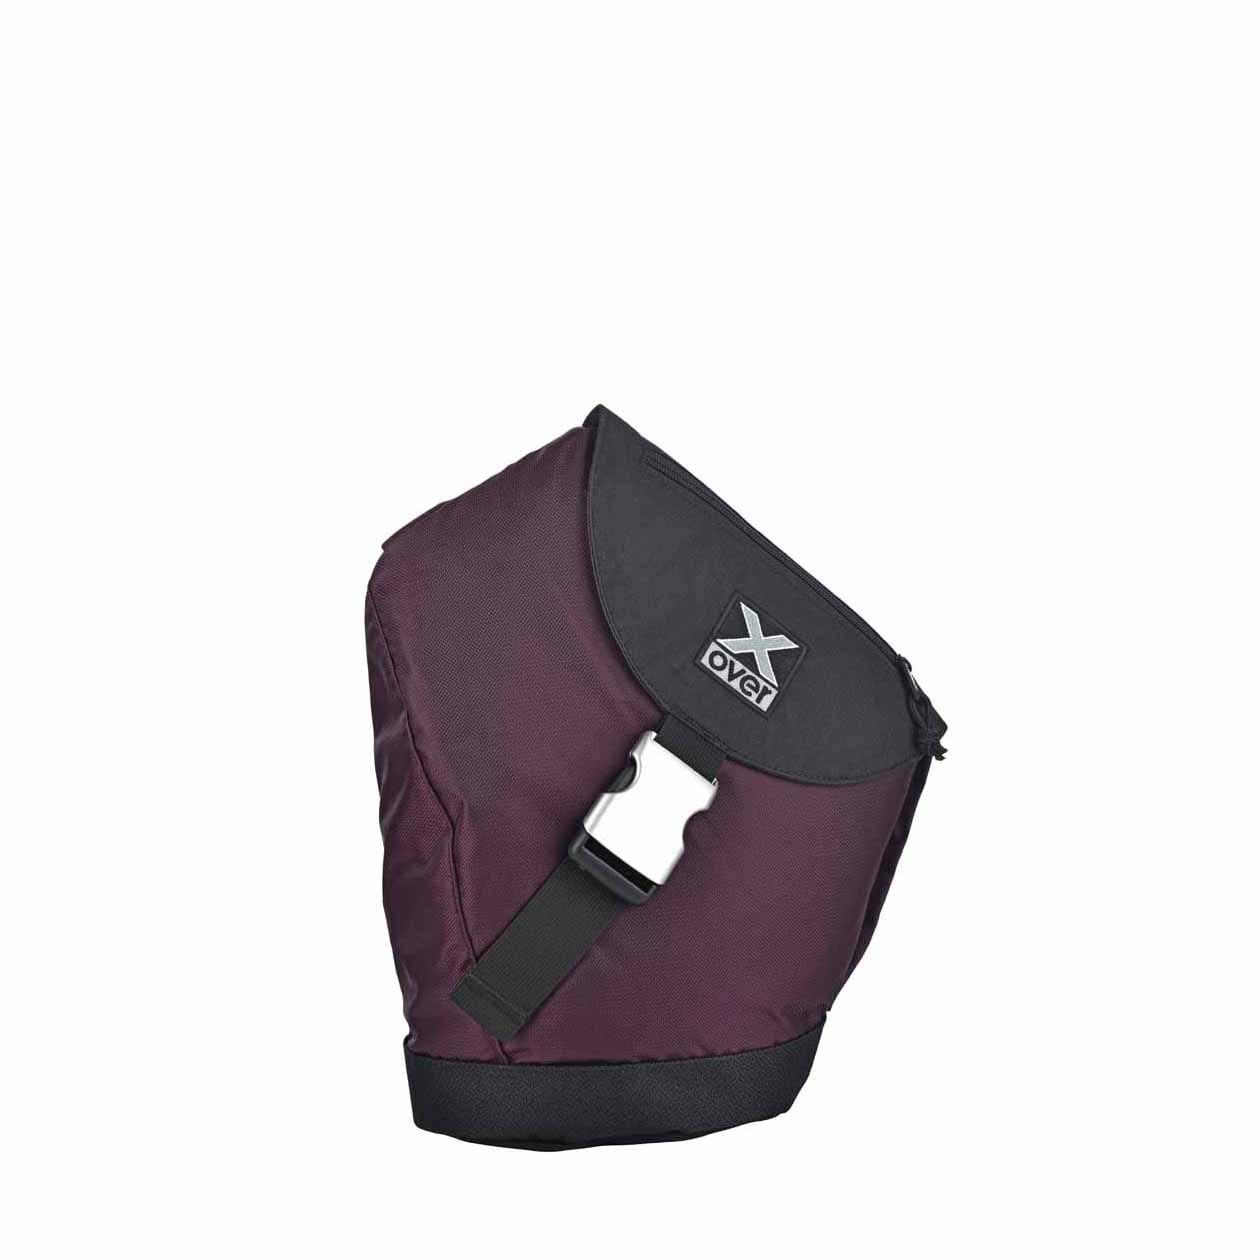 X-Over schuine rugzak original barcelona black purple Small